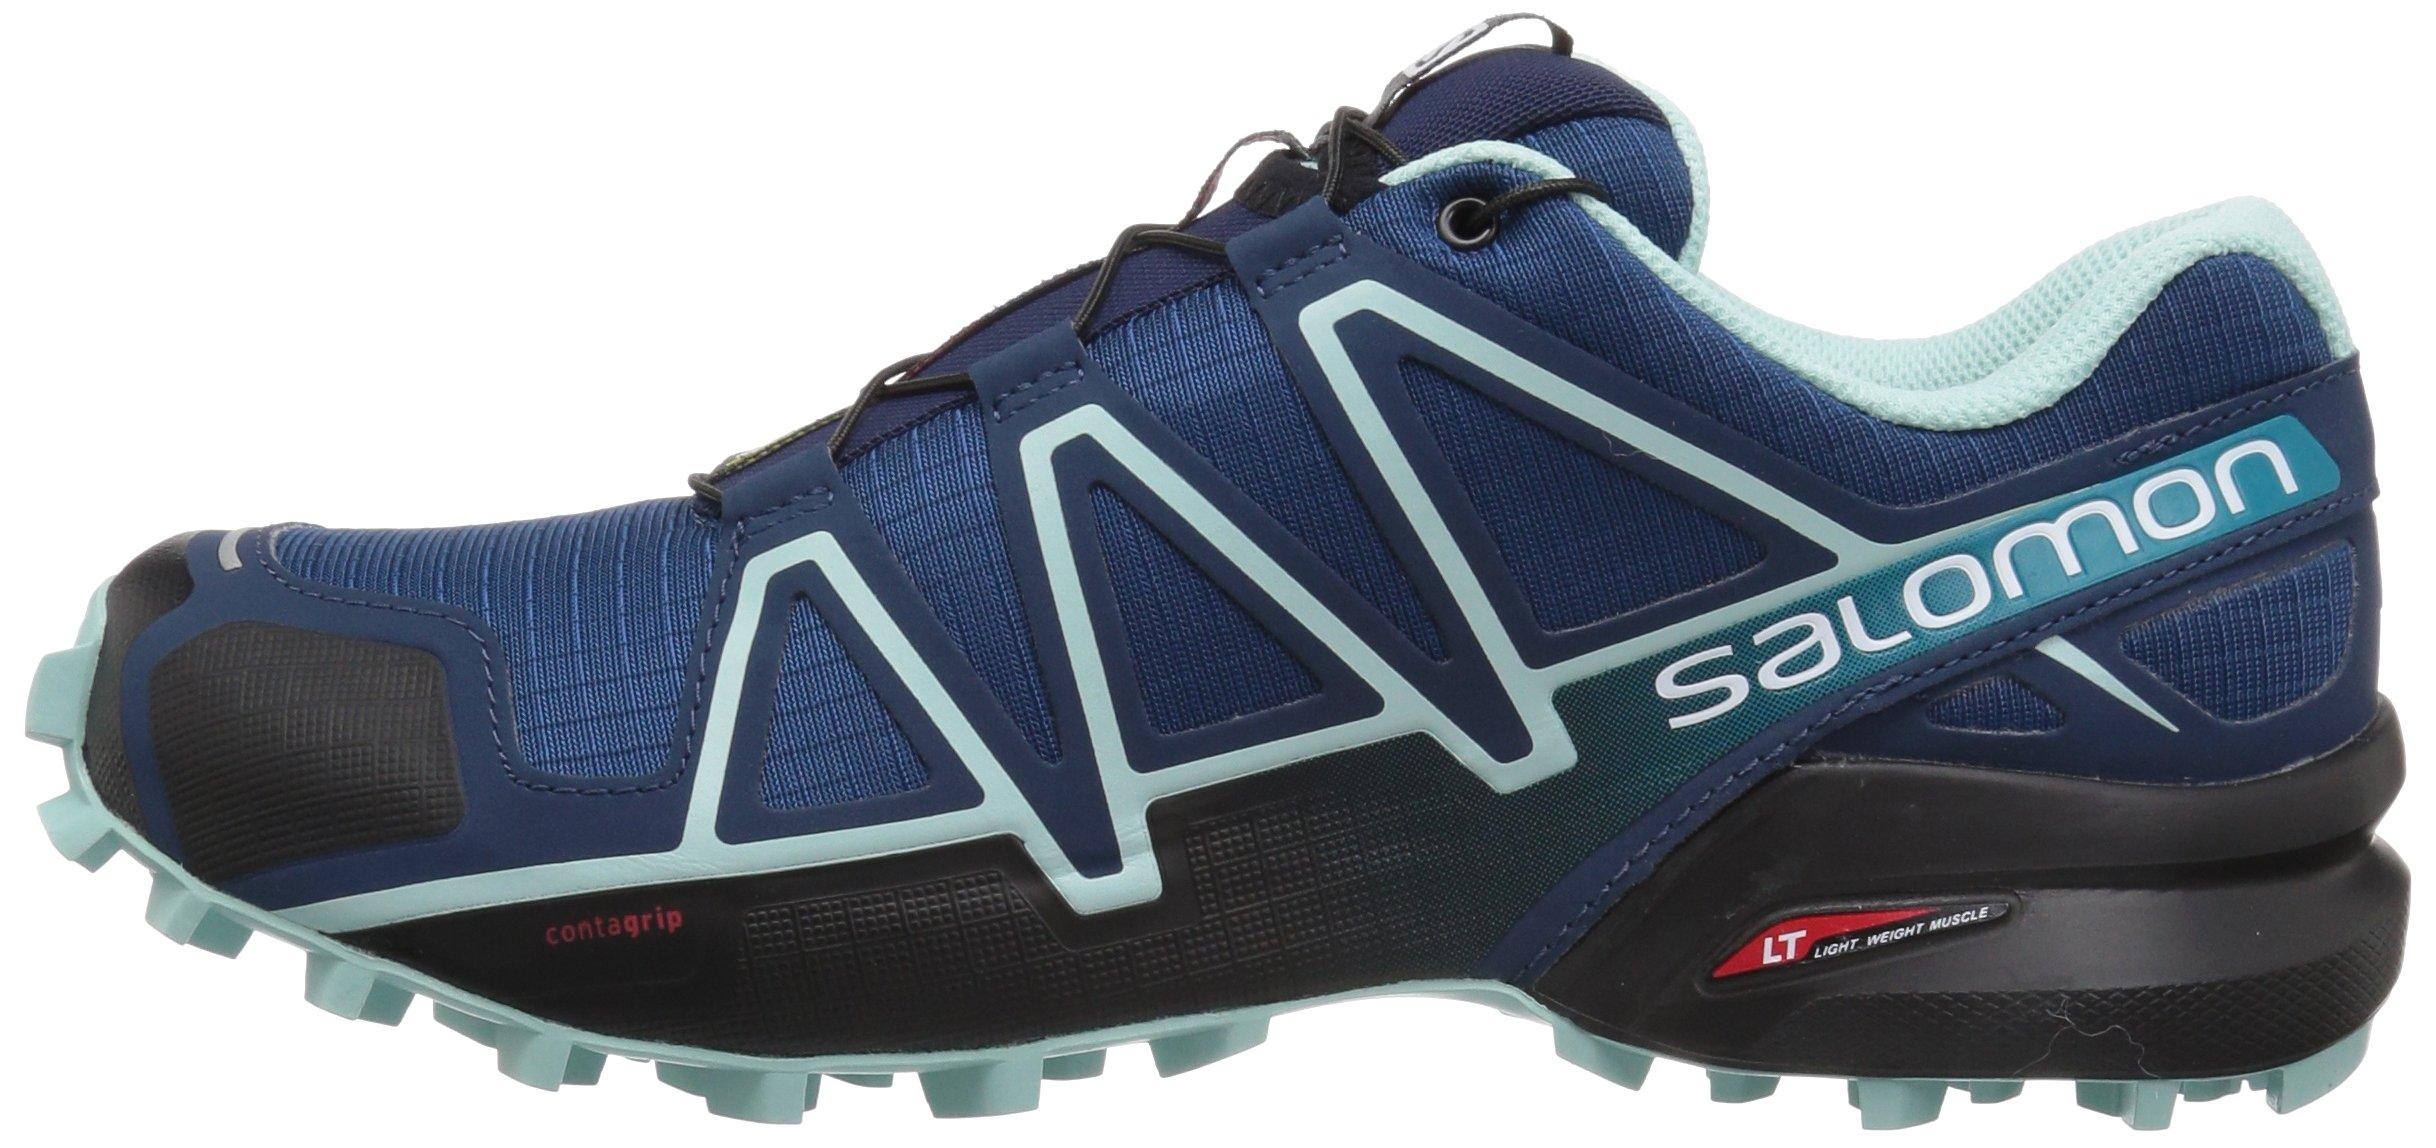 130ed4c71a7c Salomon Women s Speedcross 4 W Trail Running Shoe Poseidon 5.5 M US -  L40243100-Q587-5.5 M US   Trail Running   Clothing